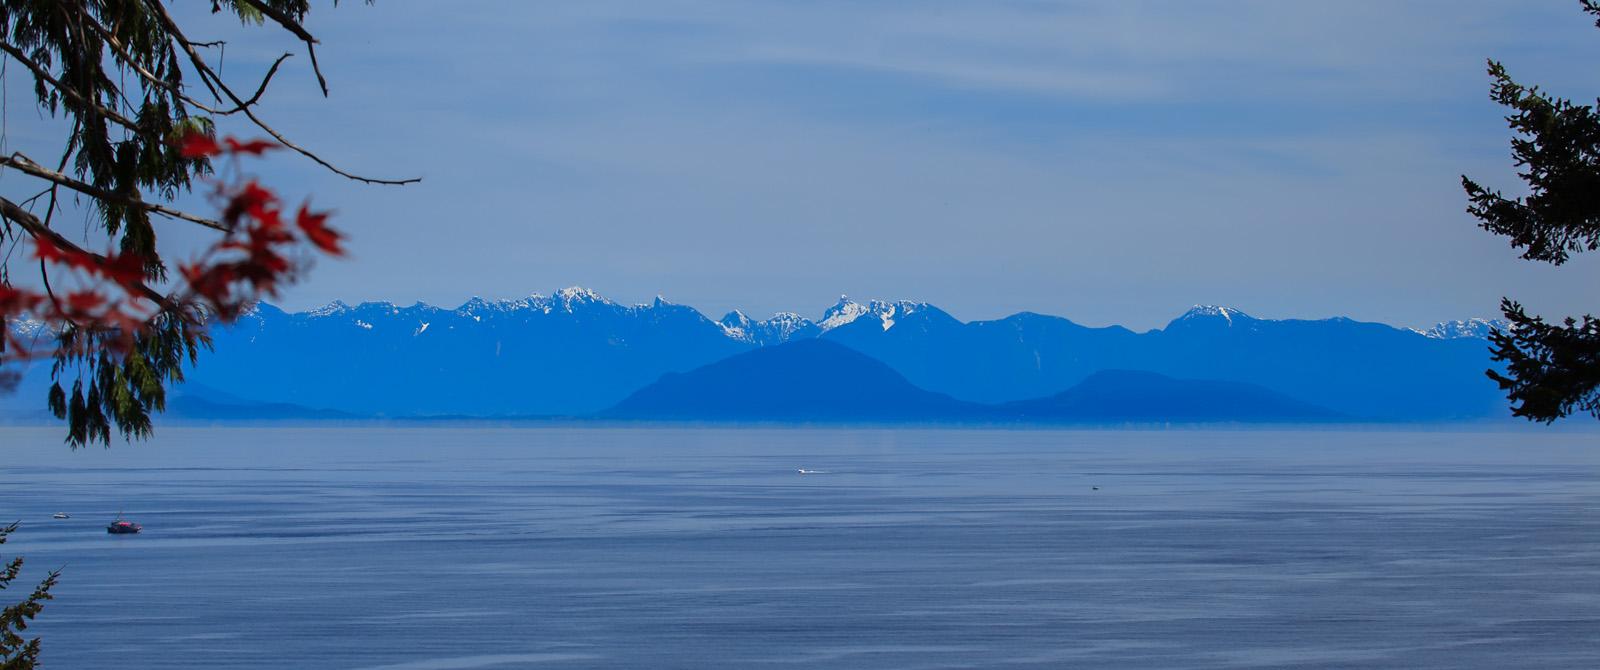 Gabriola island oceanfront 05